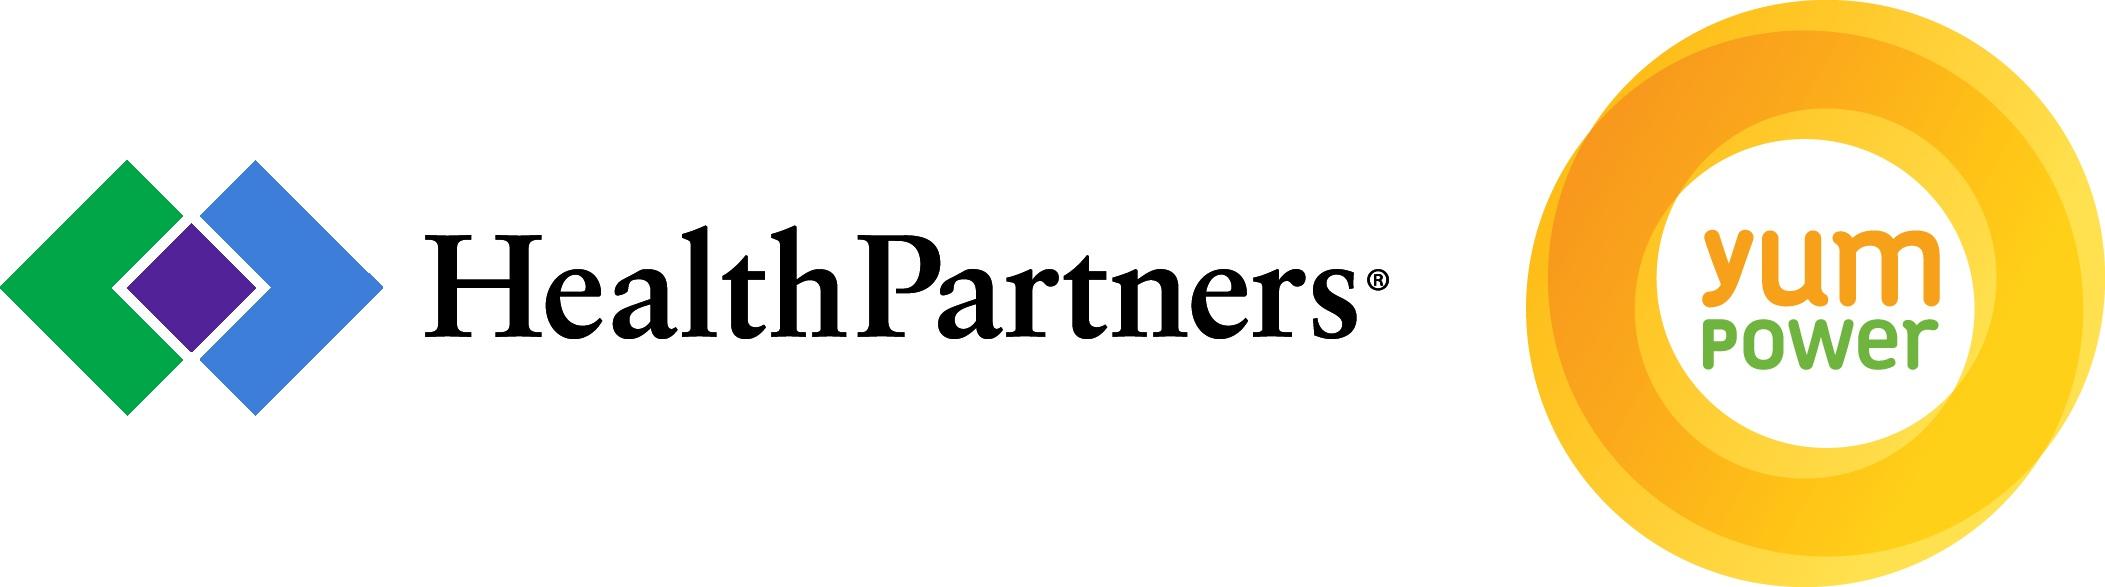 healthpartners.jpg